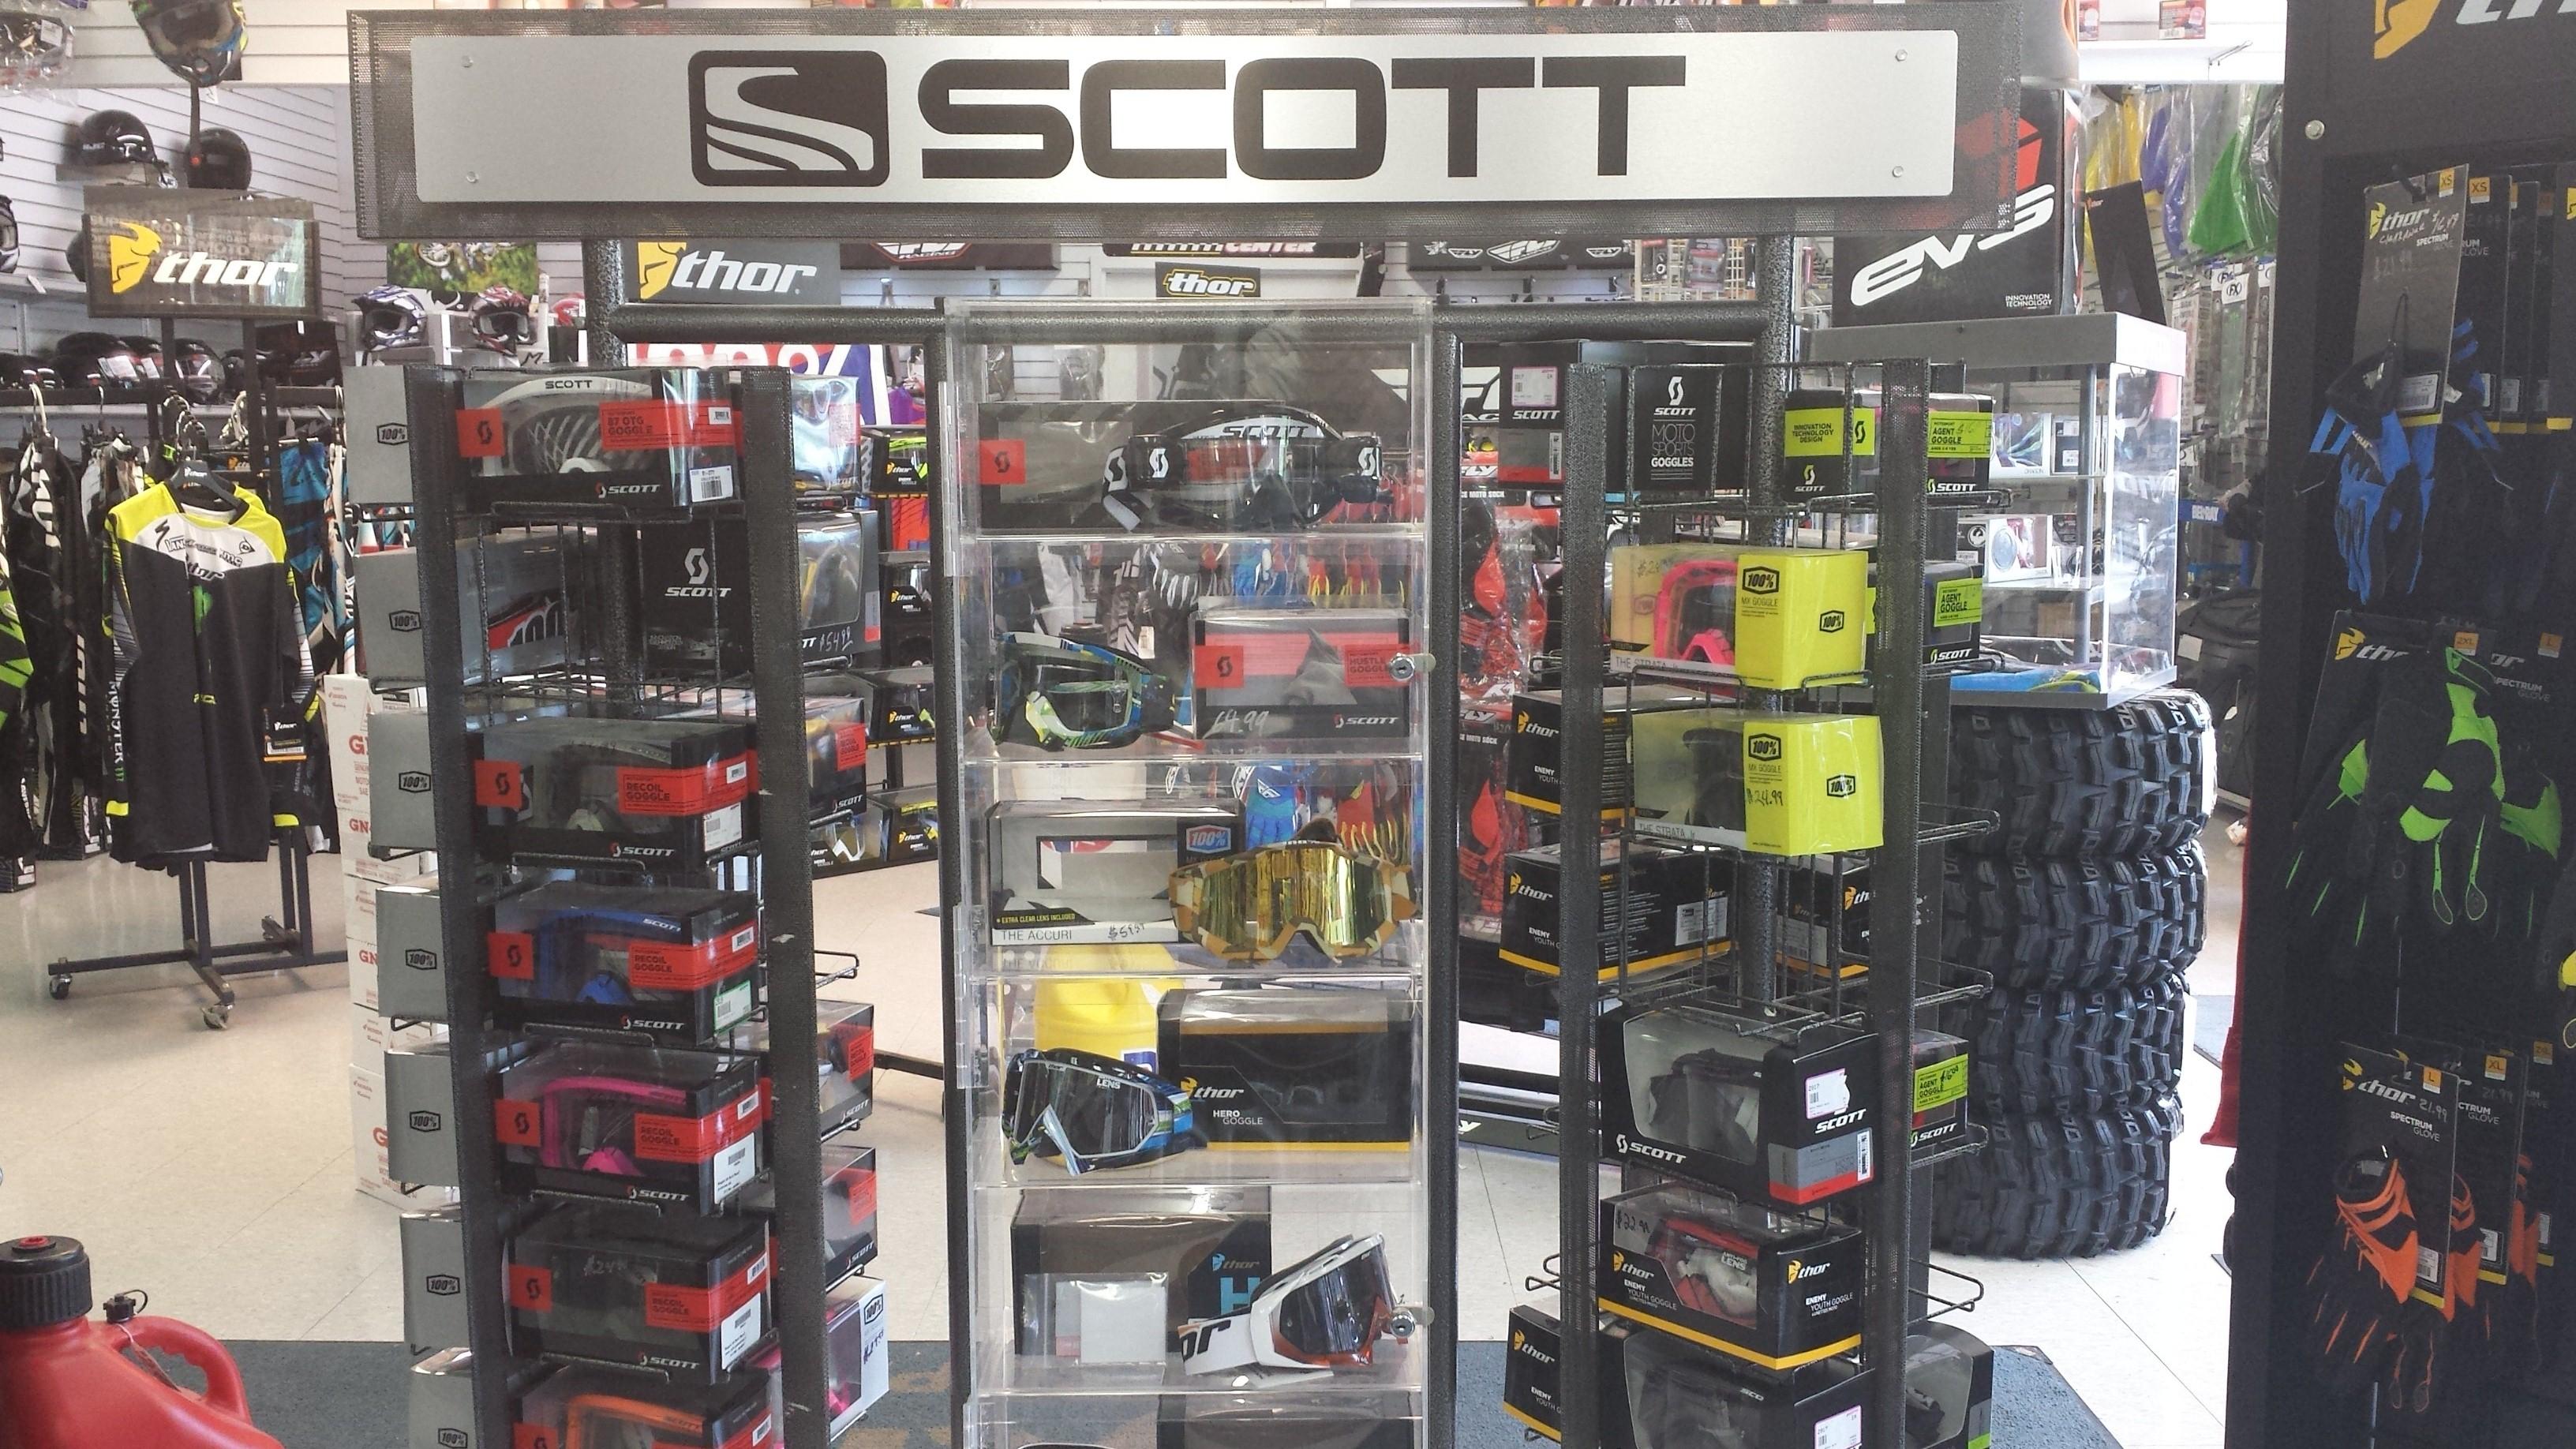 Scott/ 100%/ Thor goggles